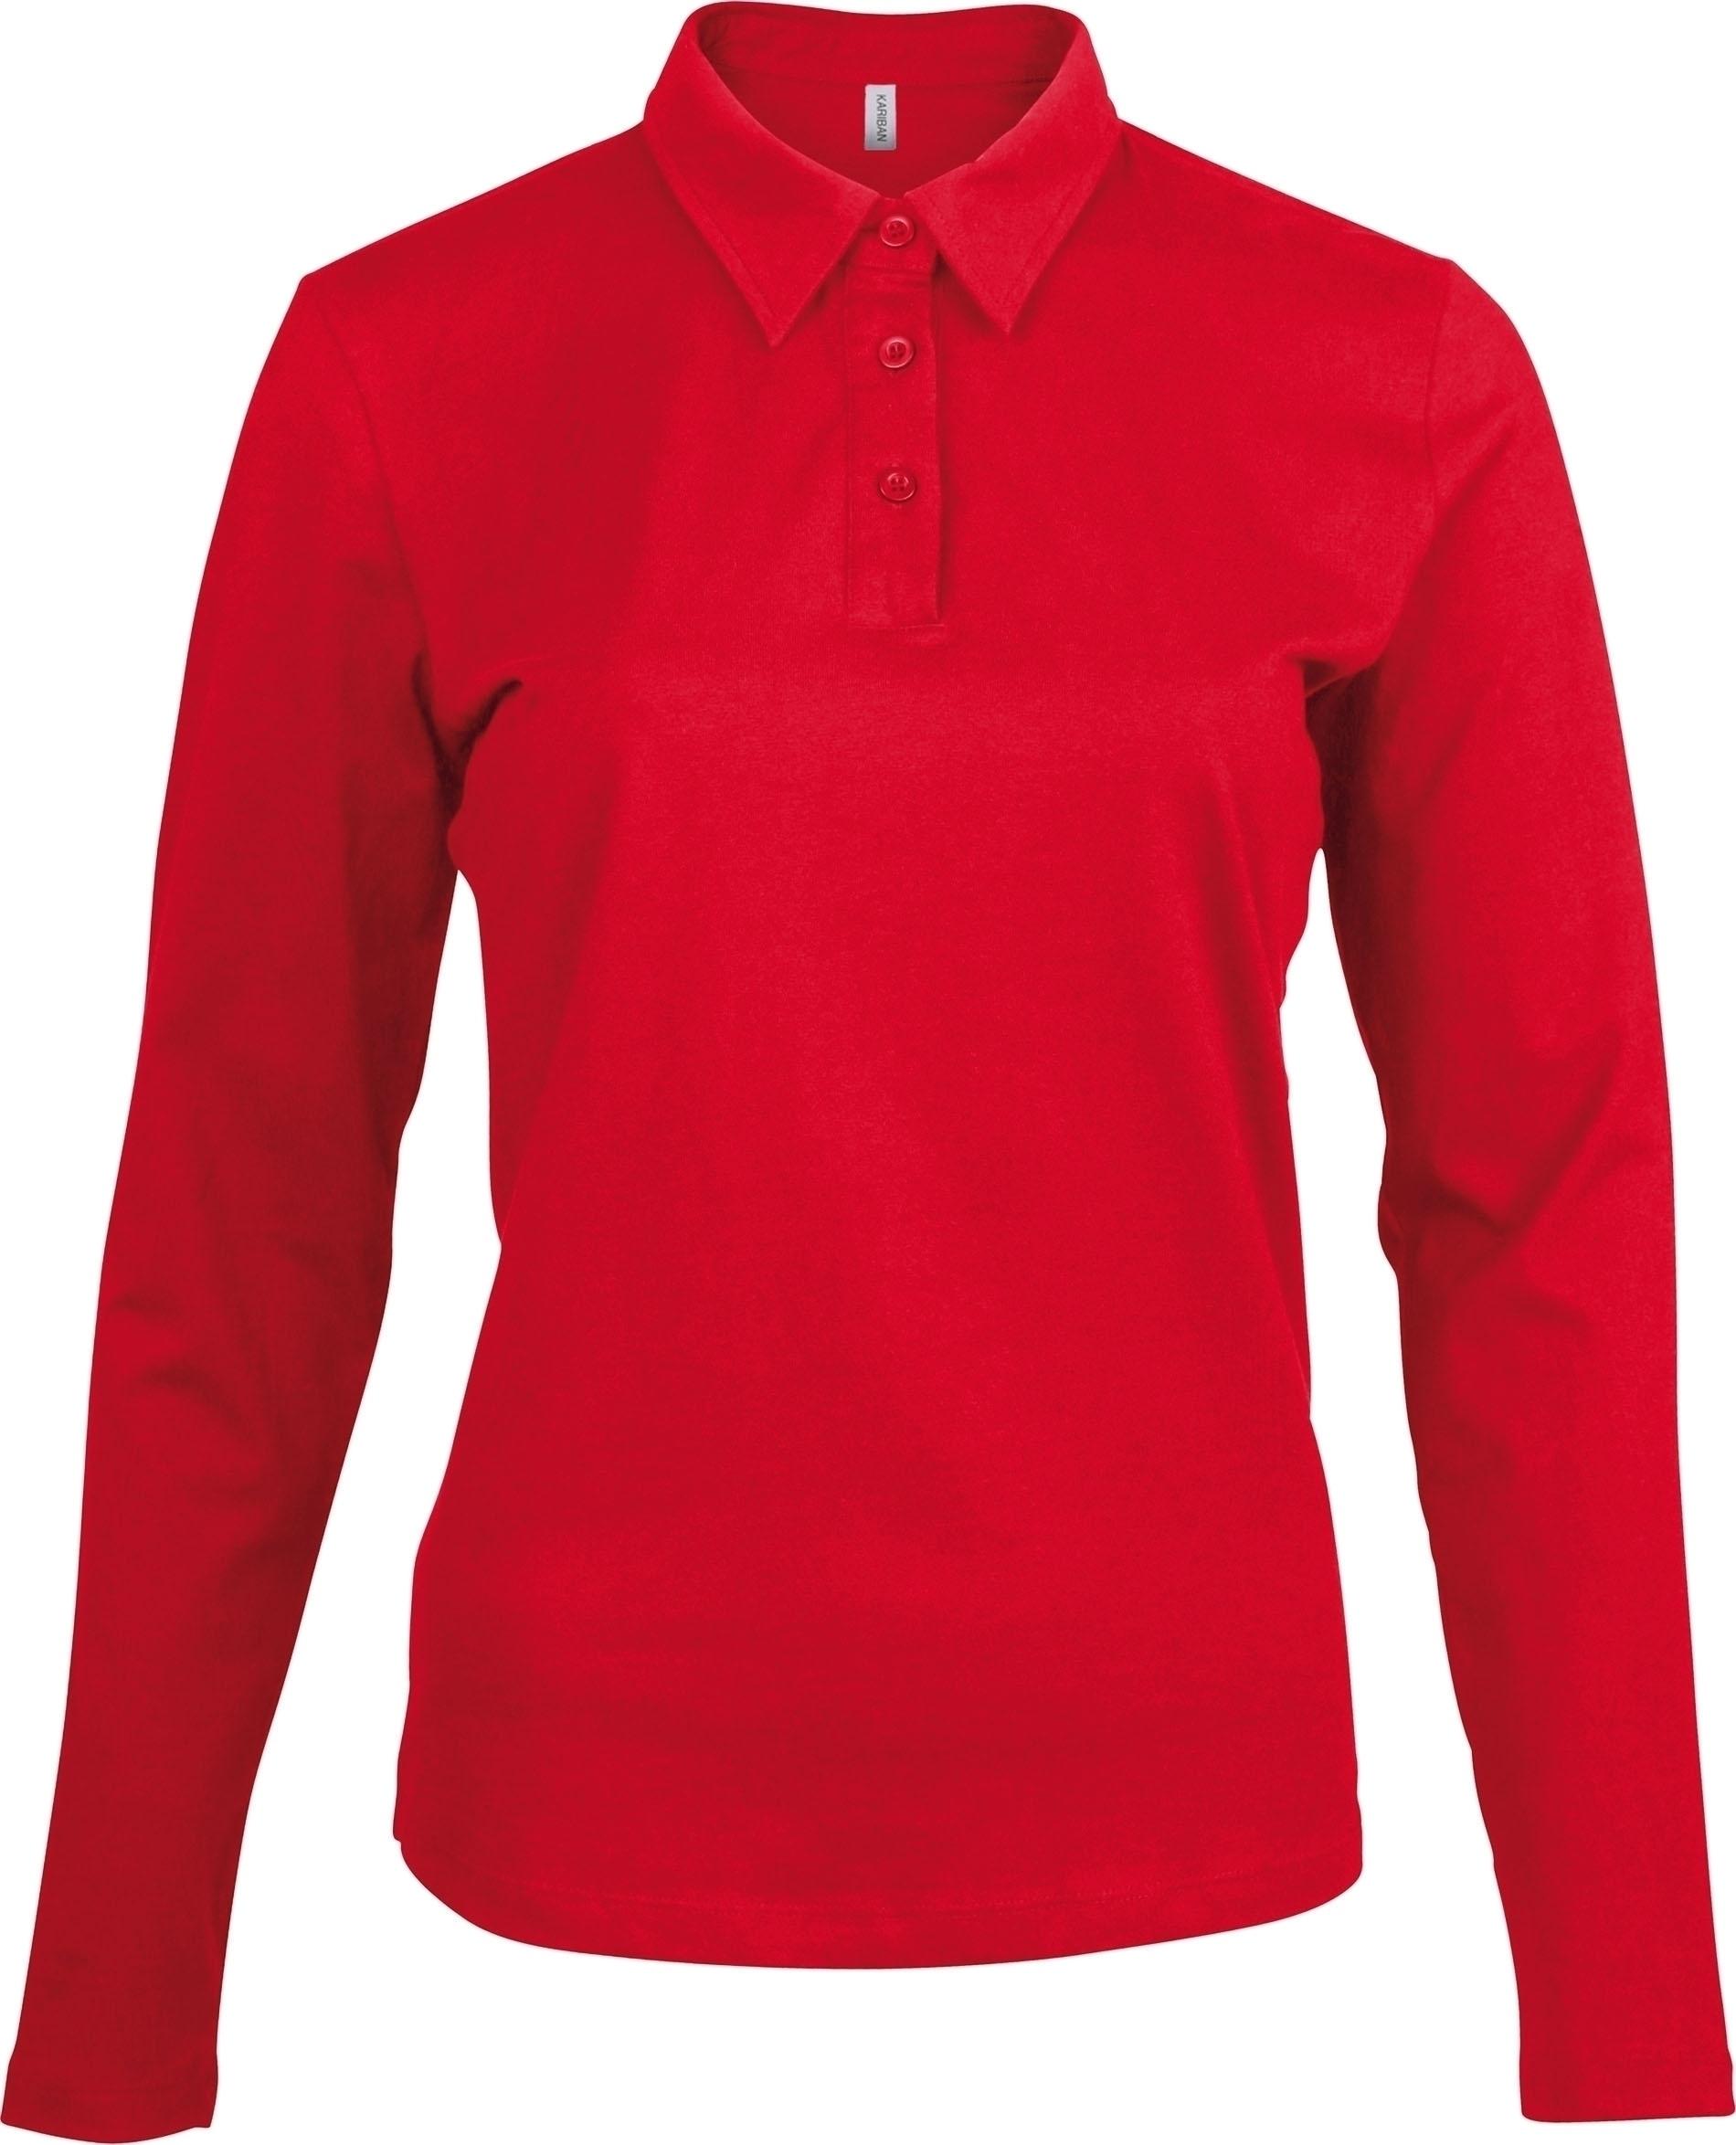 Longues Jersey Manches Femme Gladiasport Red Polo K3FTlJc1